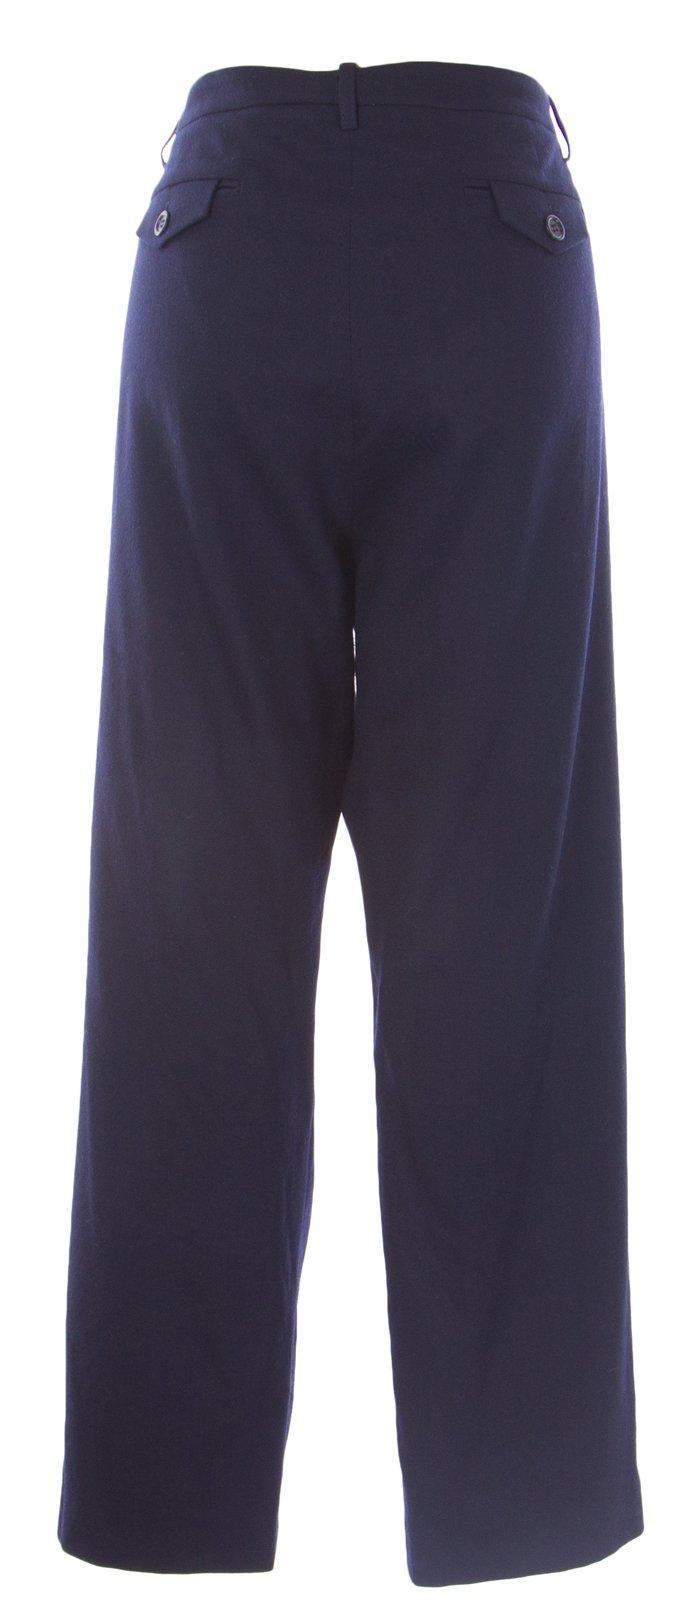 BODEN Women's Fine Wool Flared Pants US Sz 18L Navy by BODEN (Image #1)